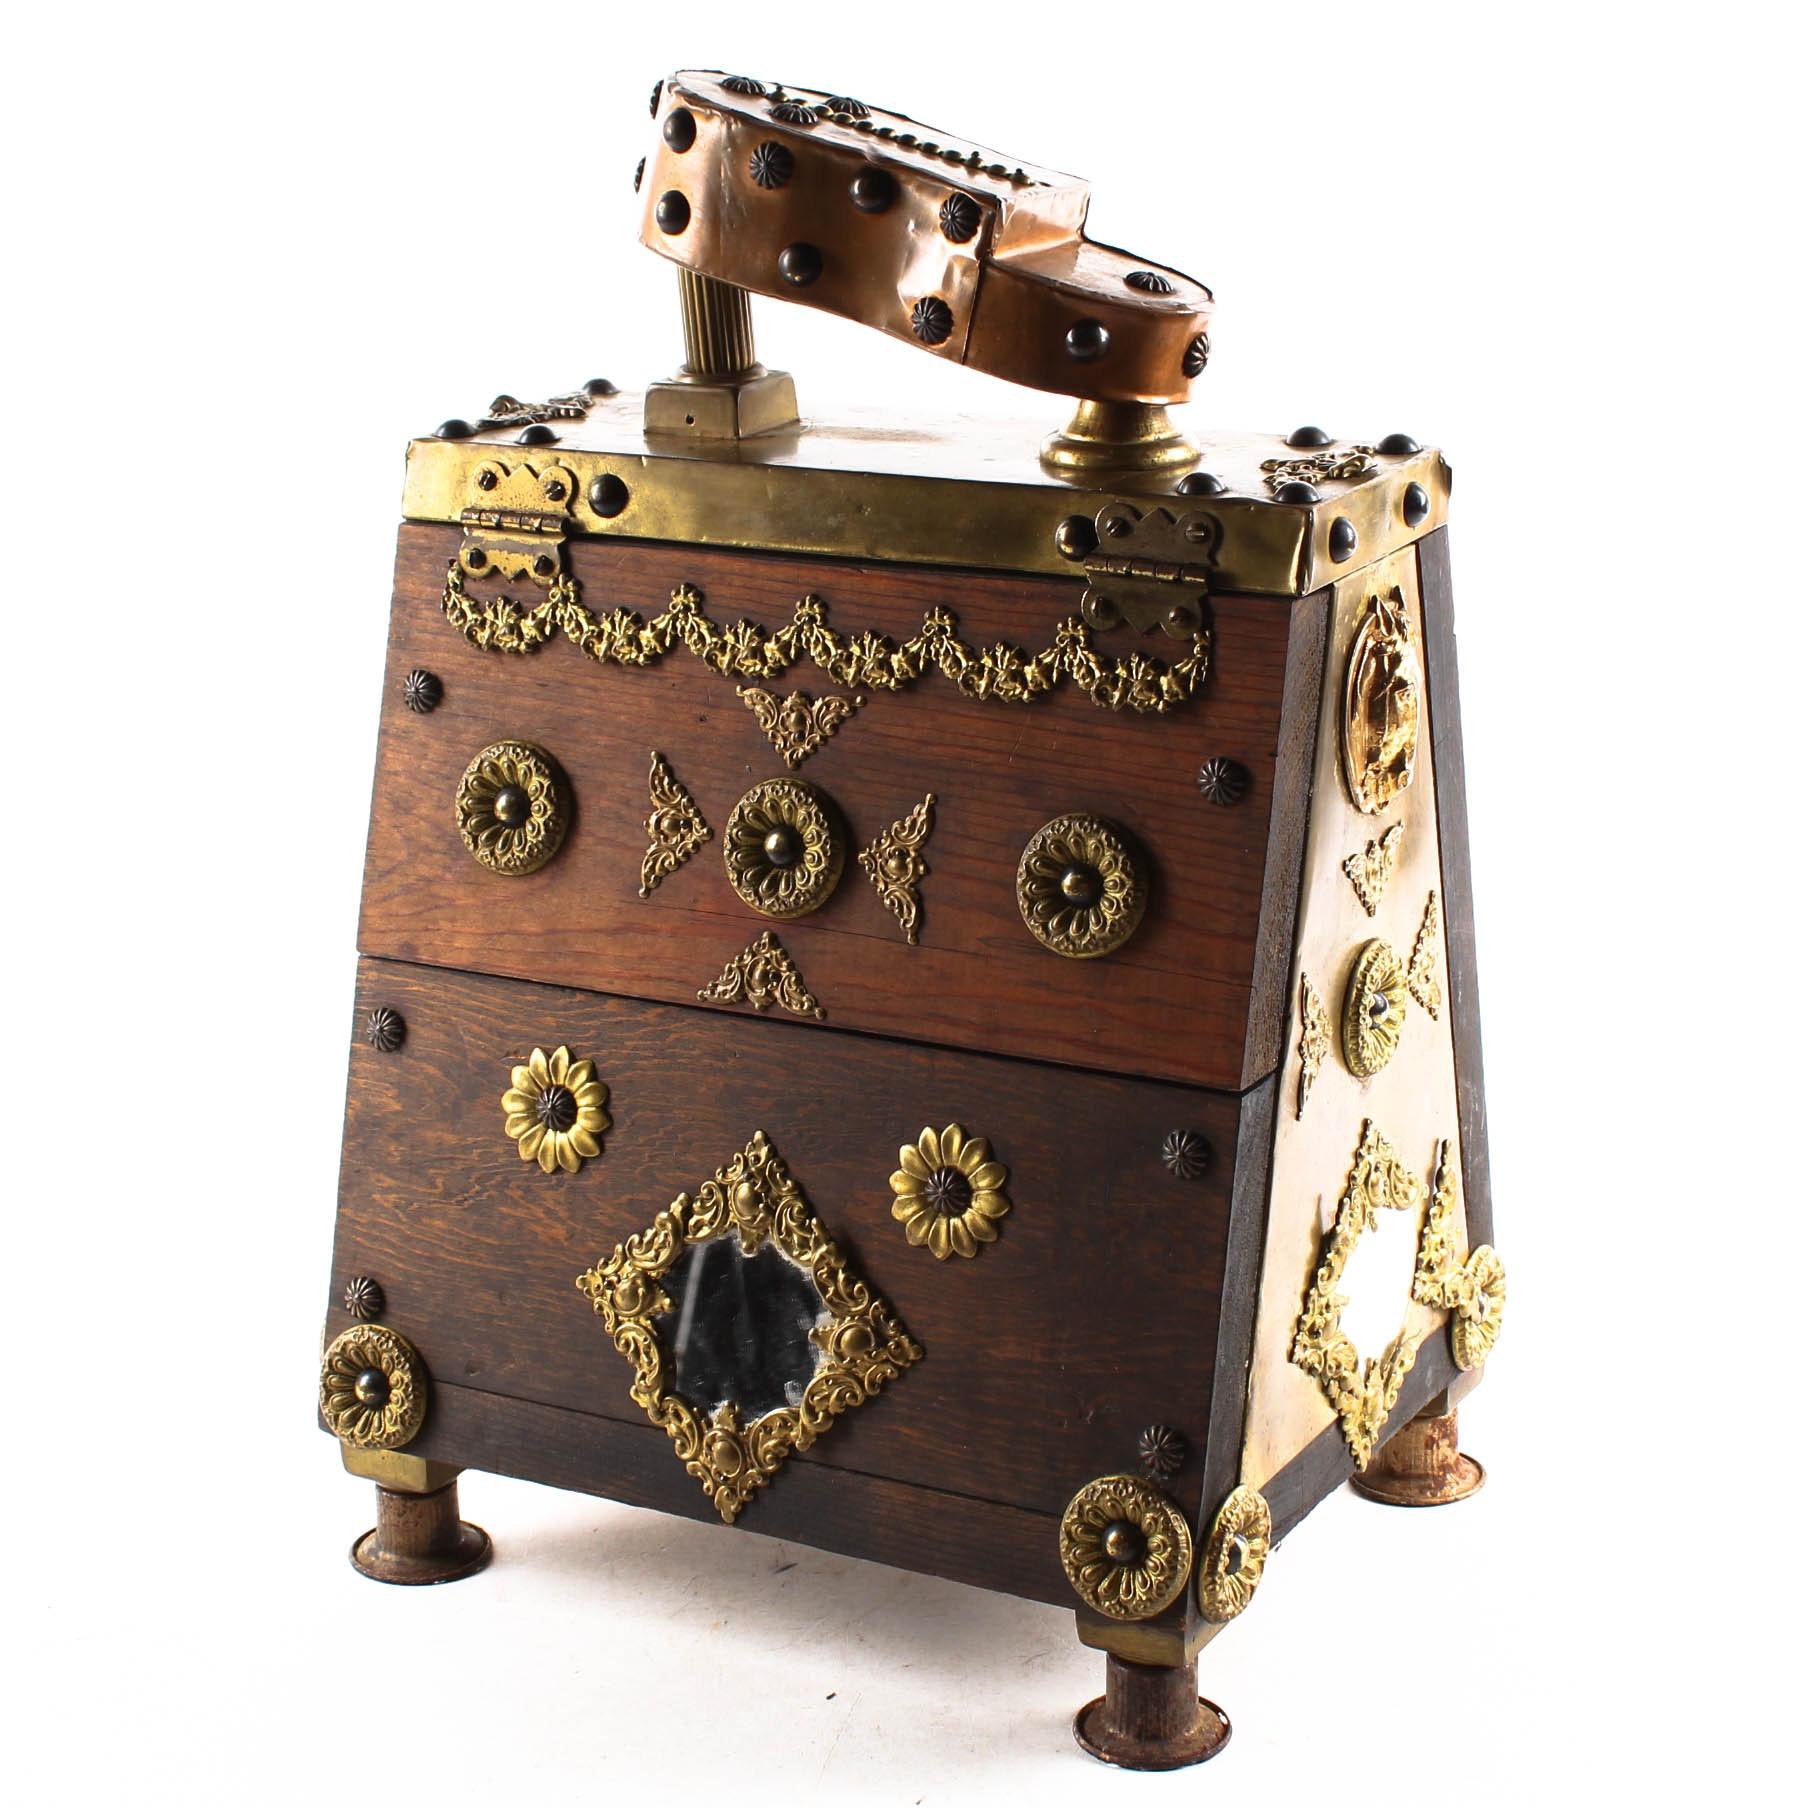 Vintage Portable Wooden Shoe Shine Box